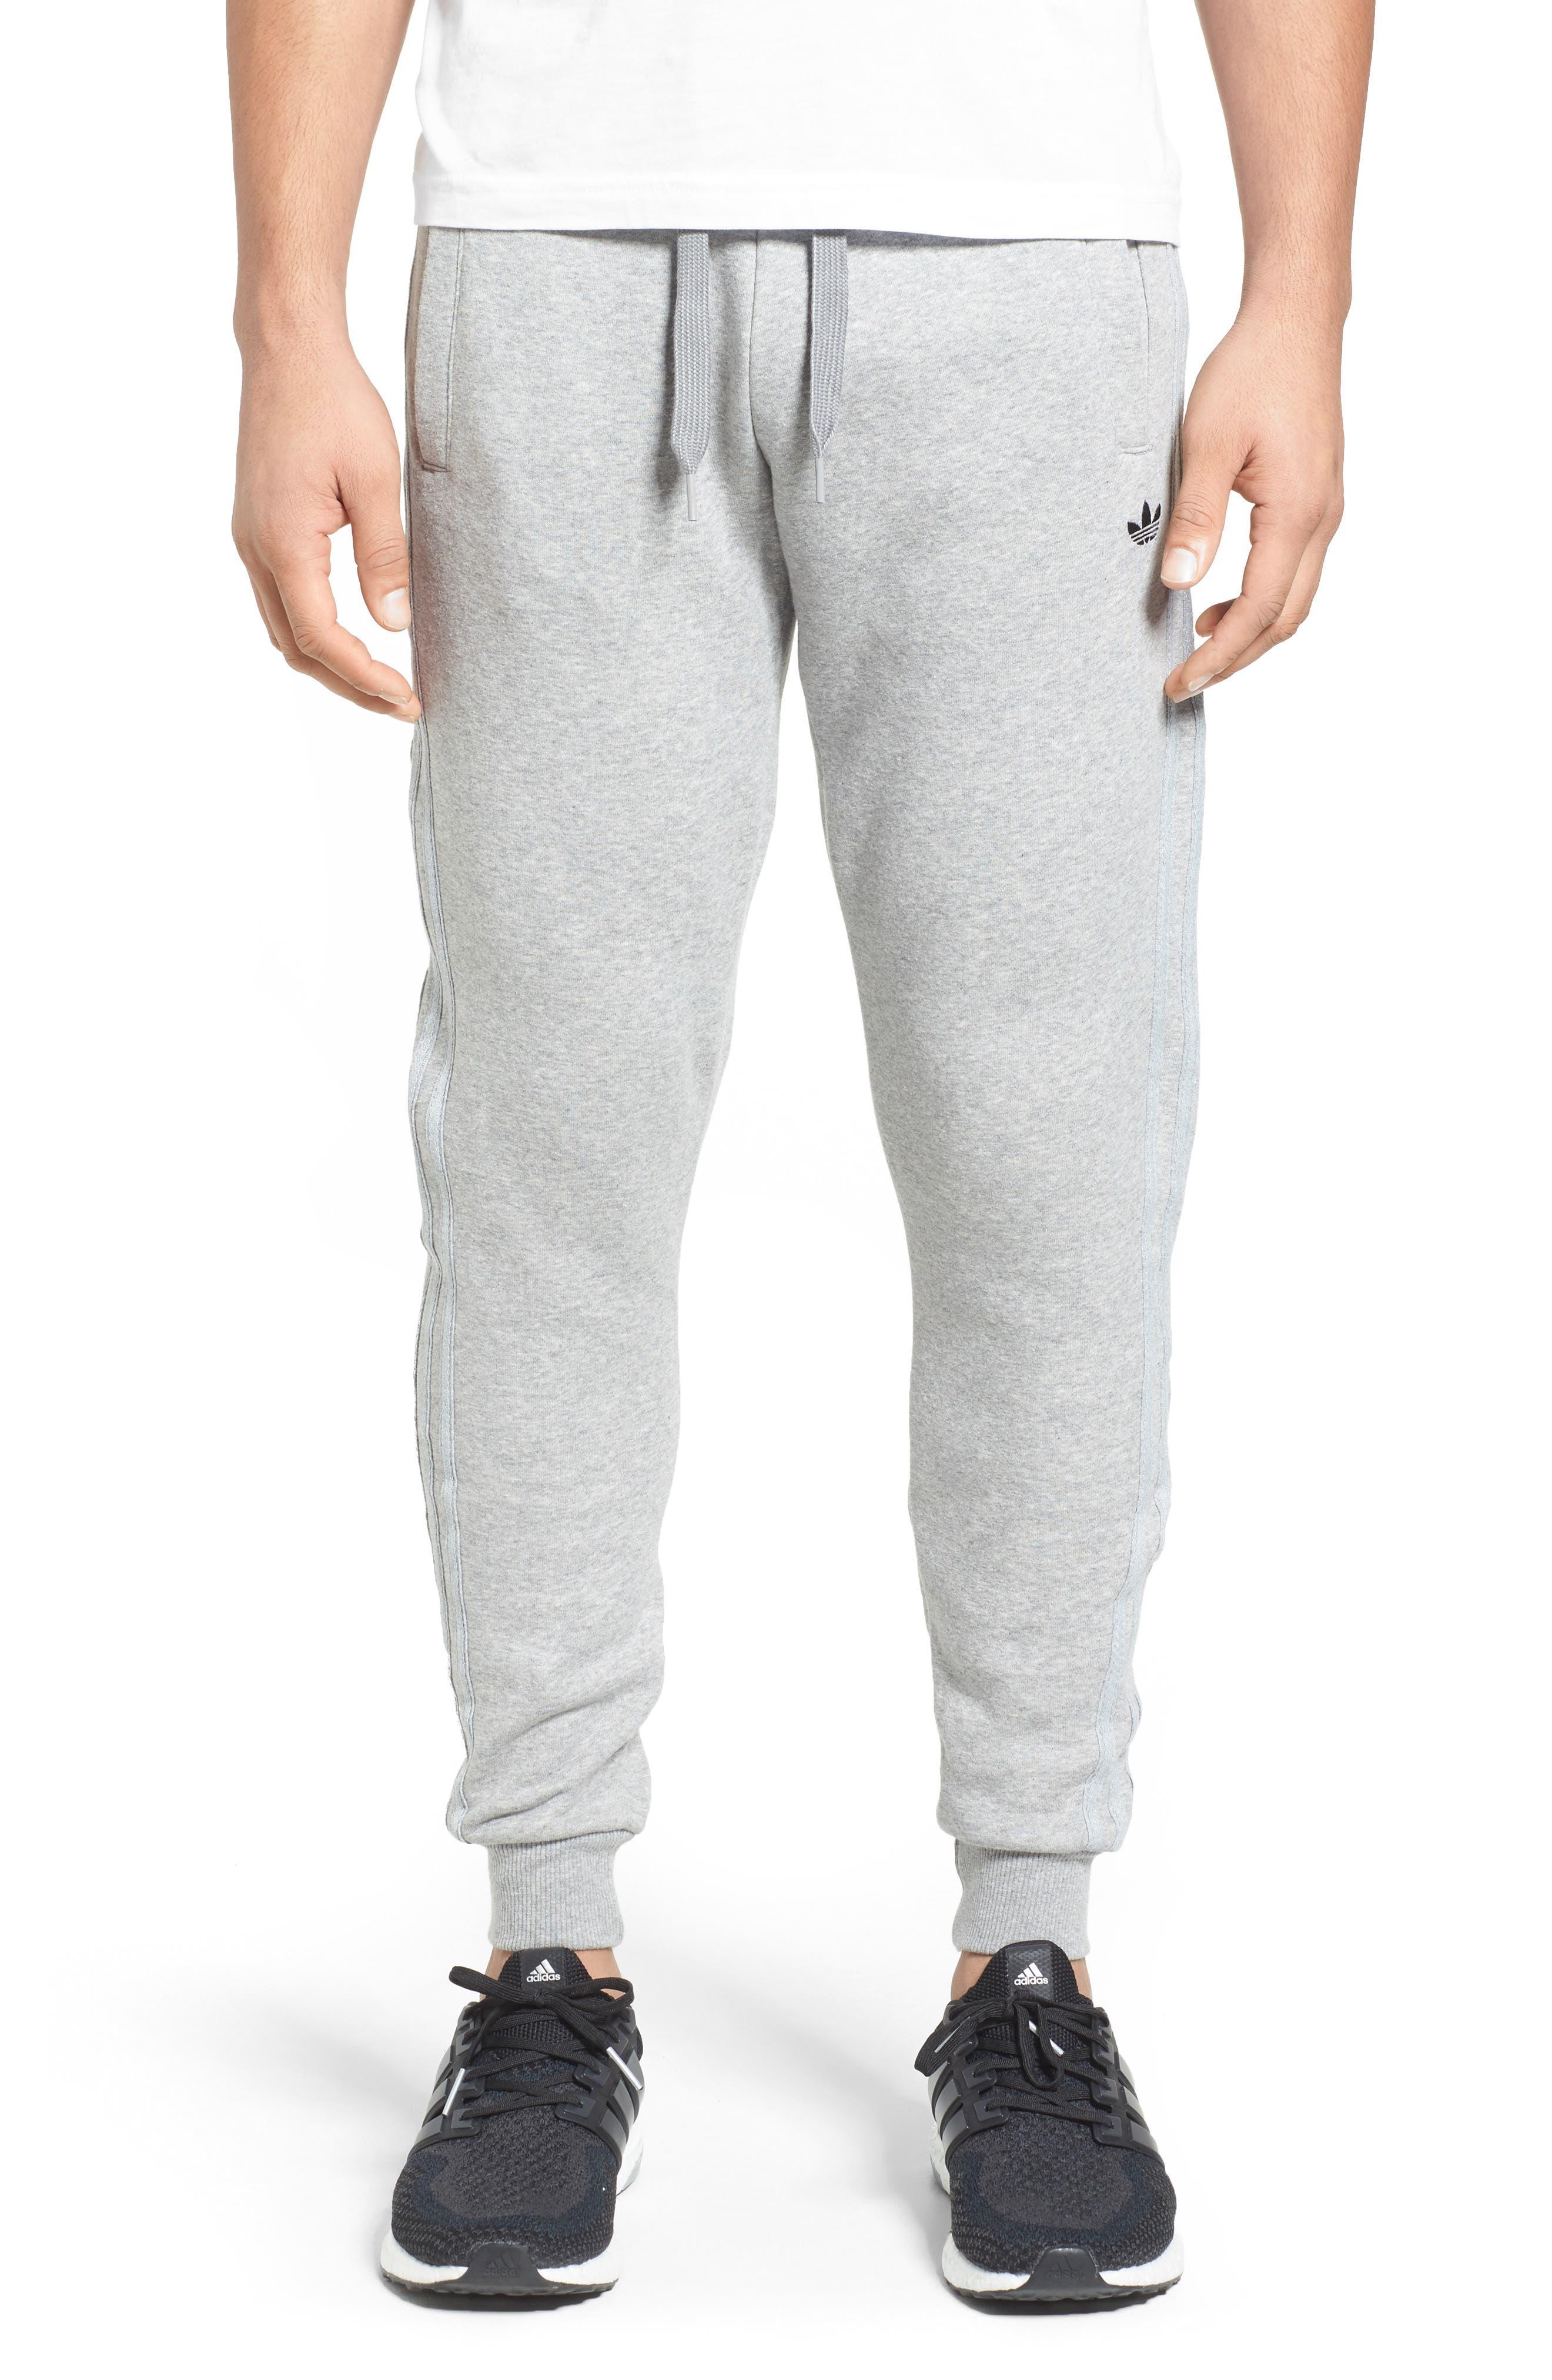 Main Image - adidas Originals Tapered Fit Sweatpants